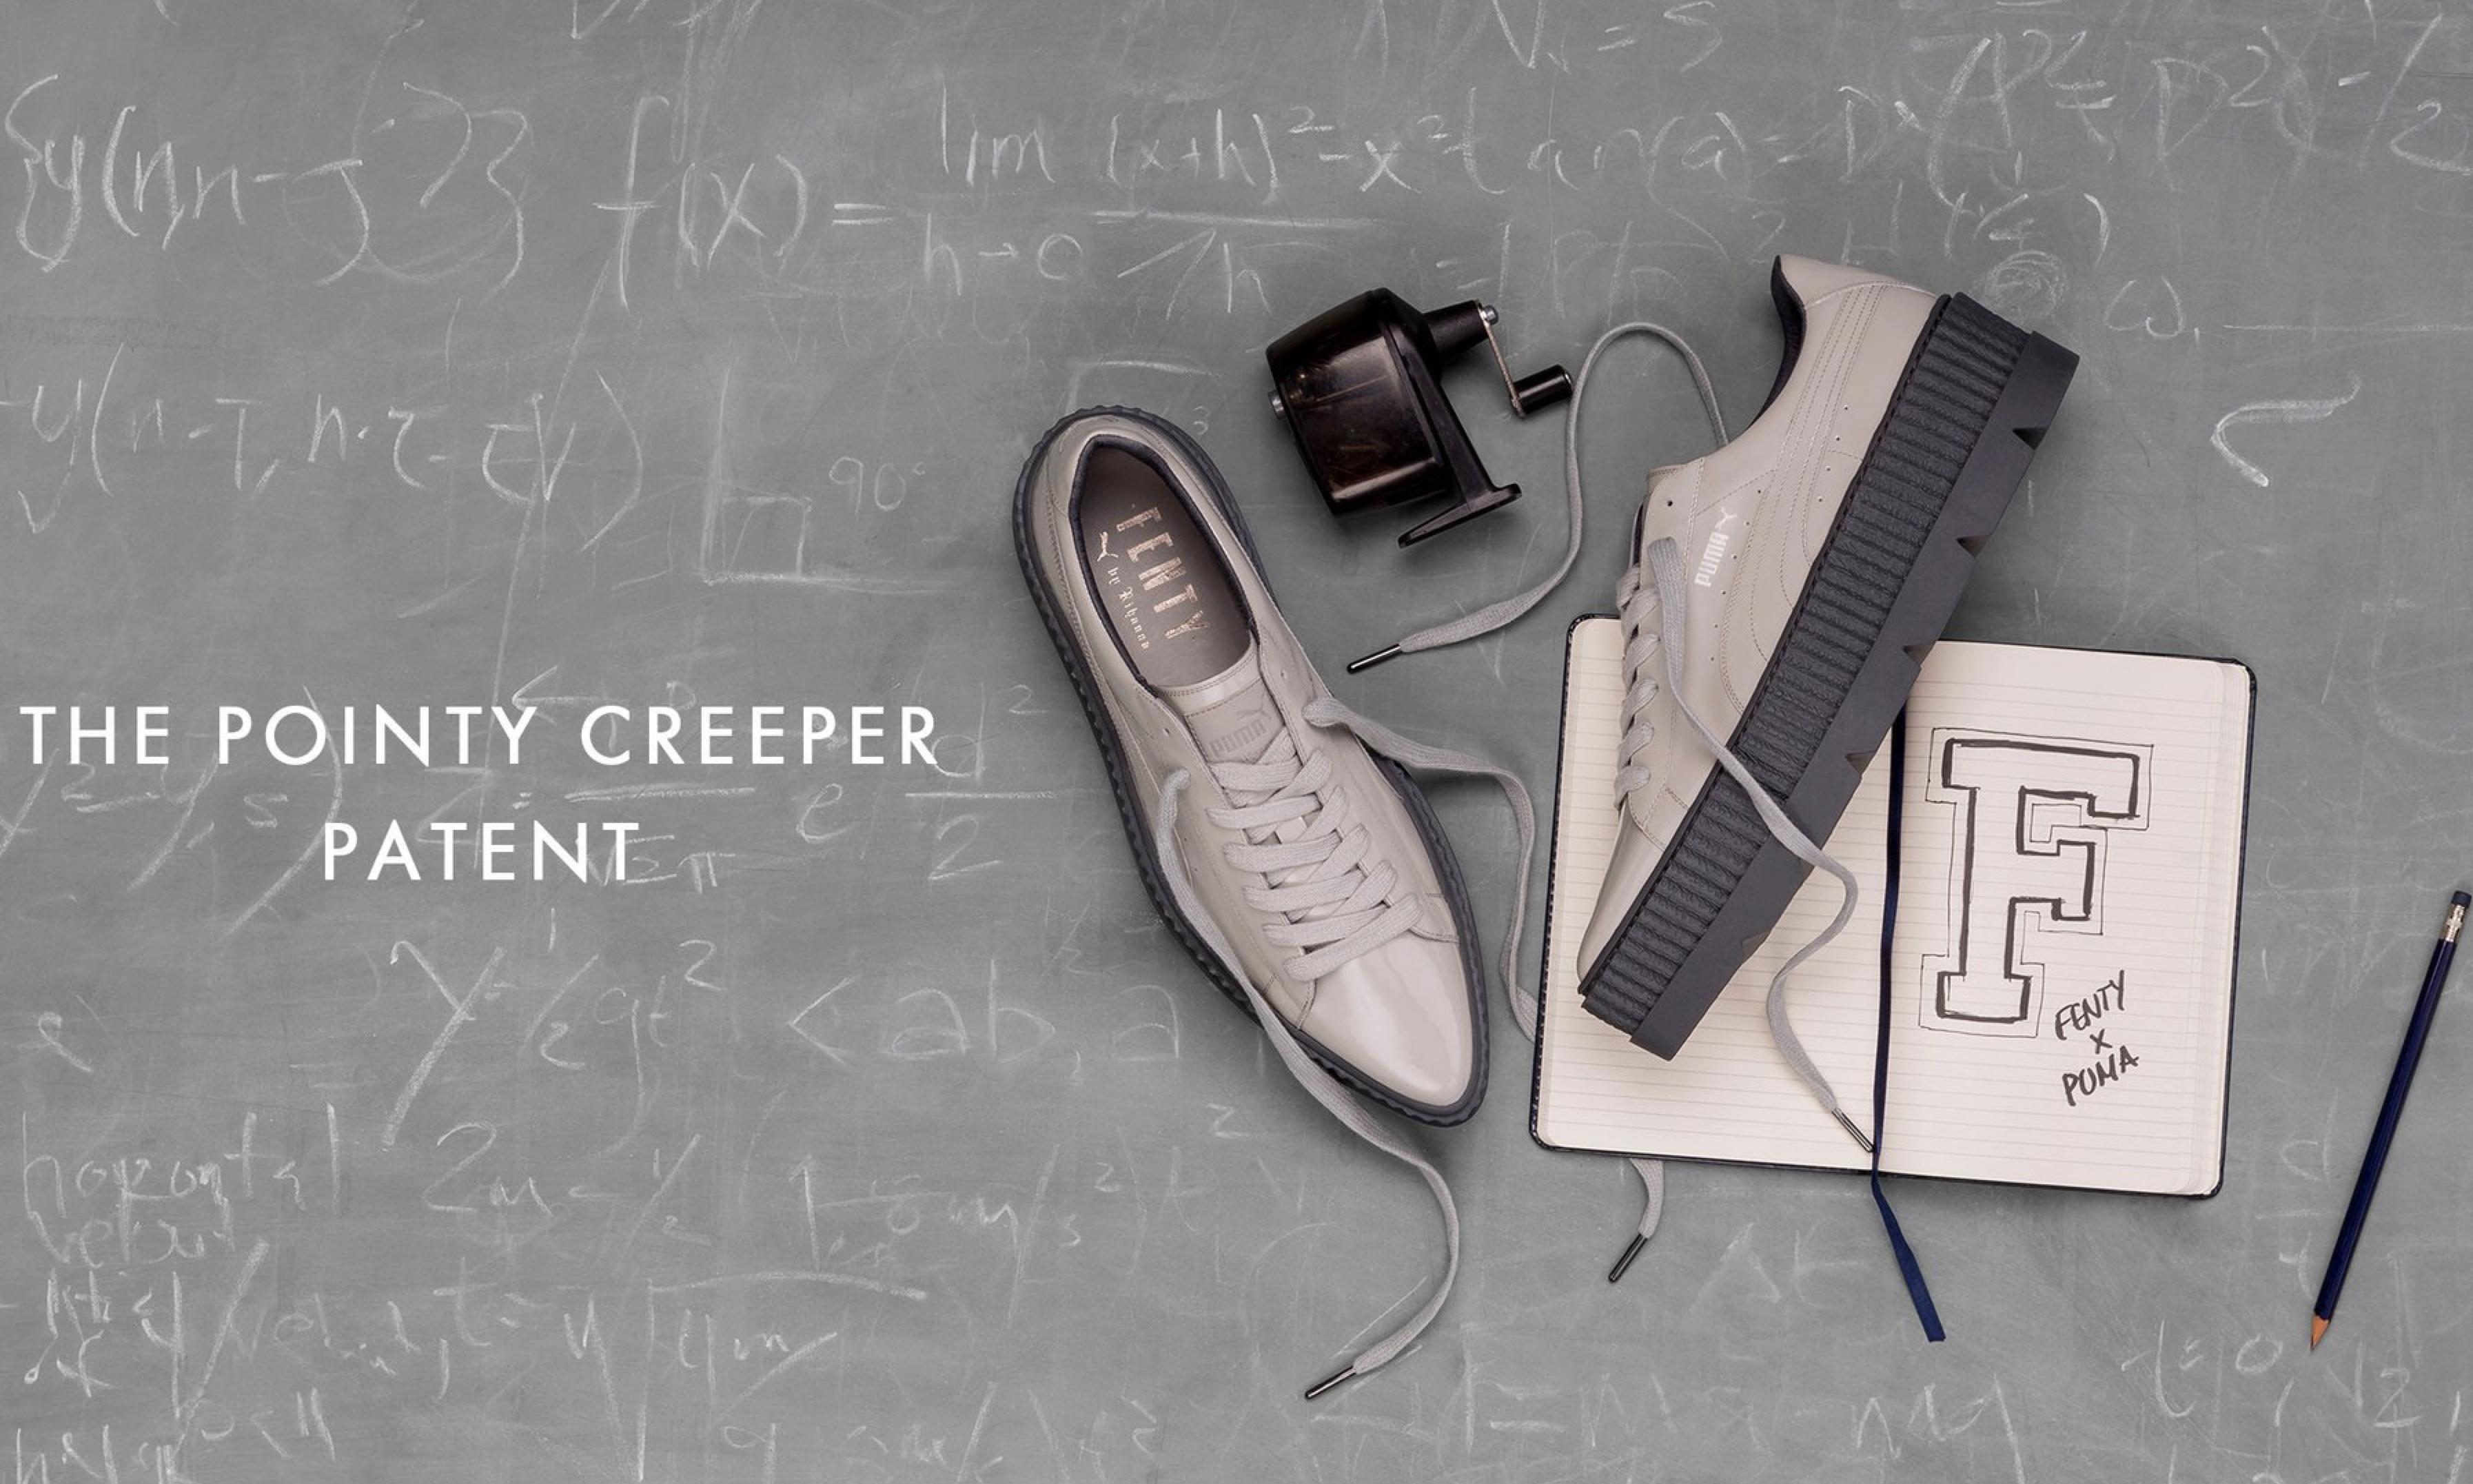 FENTY PUMA 经典 Creeper 推出尖头漆皮款